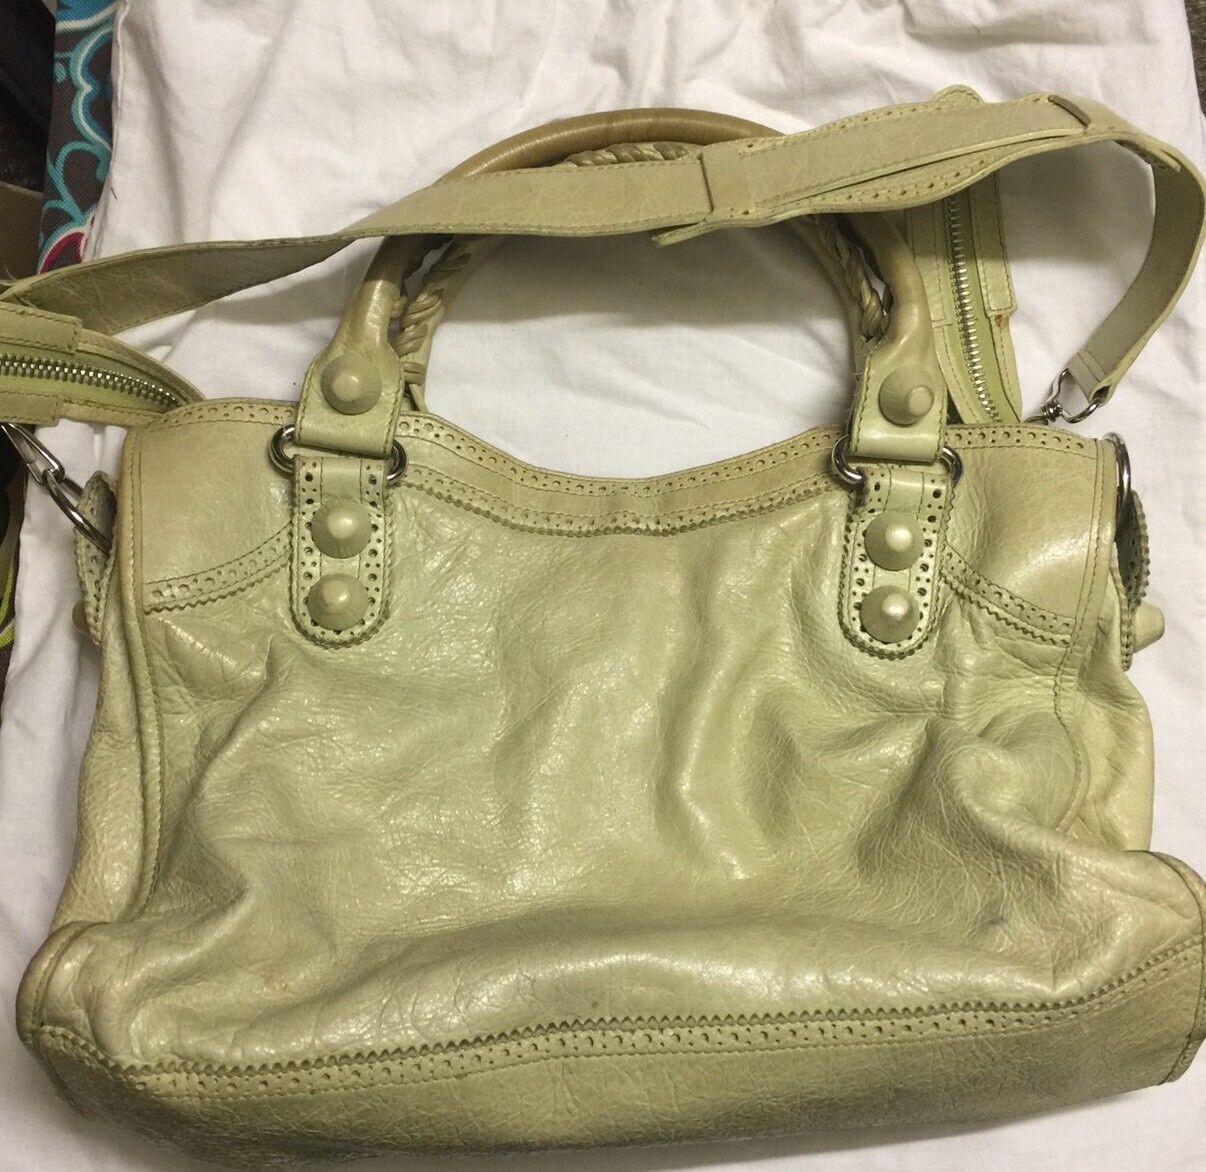 Balenciaga Tasche Pistazie Leather Giant Brogues Coverot Motorcycle City Bag Bag Bag | Verschiedene Waren  | Fierce Kaufen  | Qualität  a99242